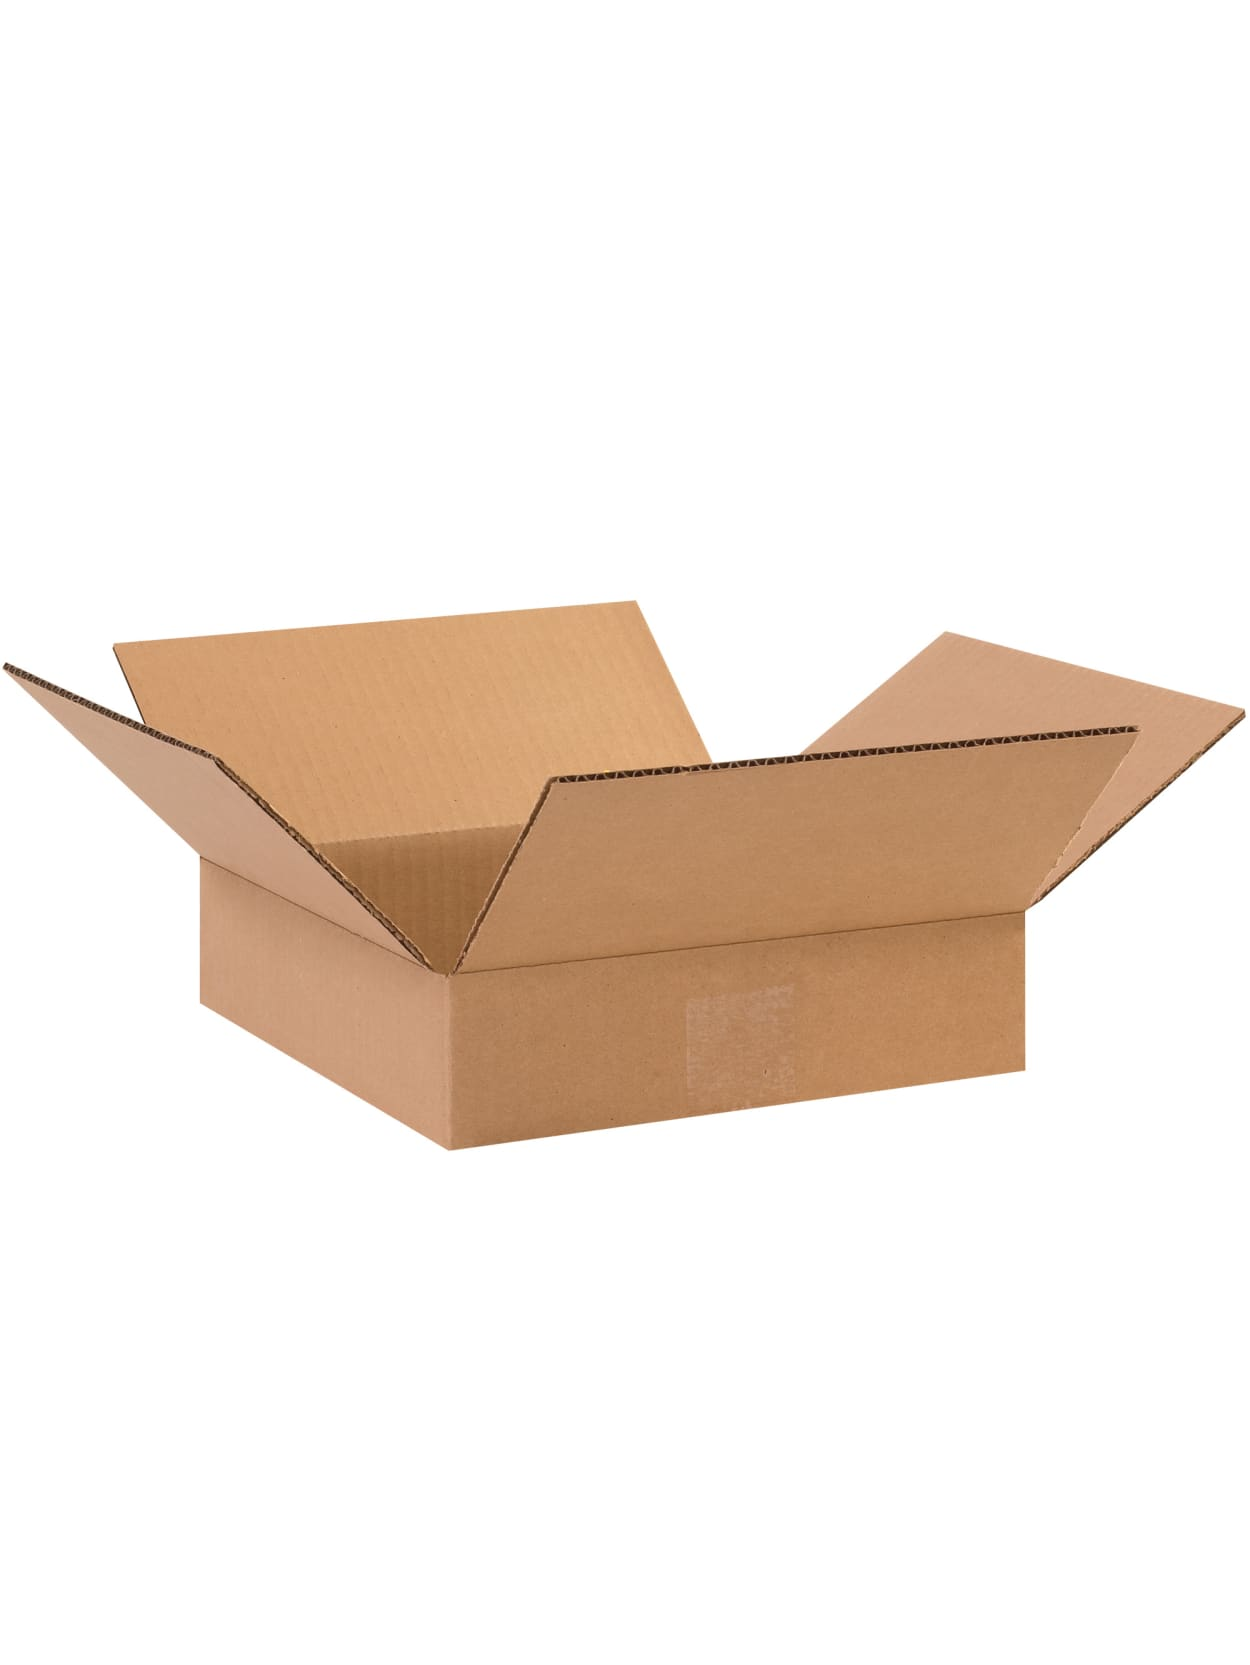 14 x 6 x 2 Flat Corrugated Boxes 25//Bundle Kraft